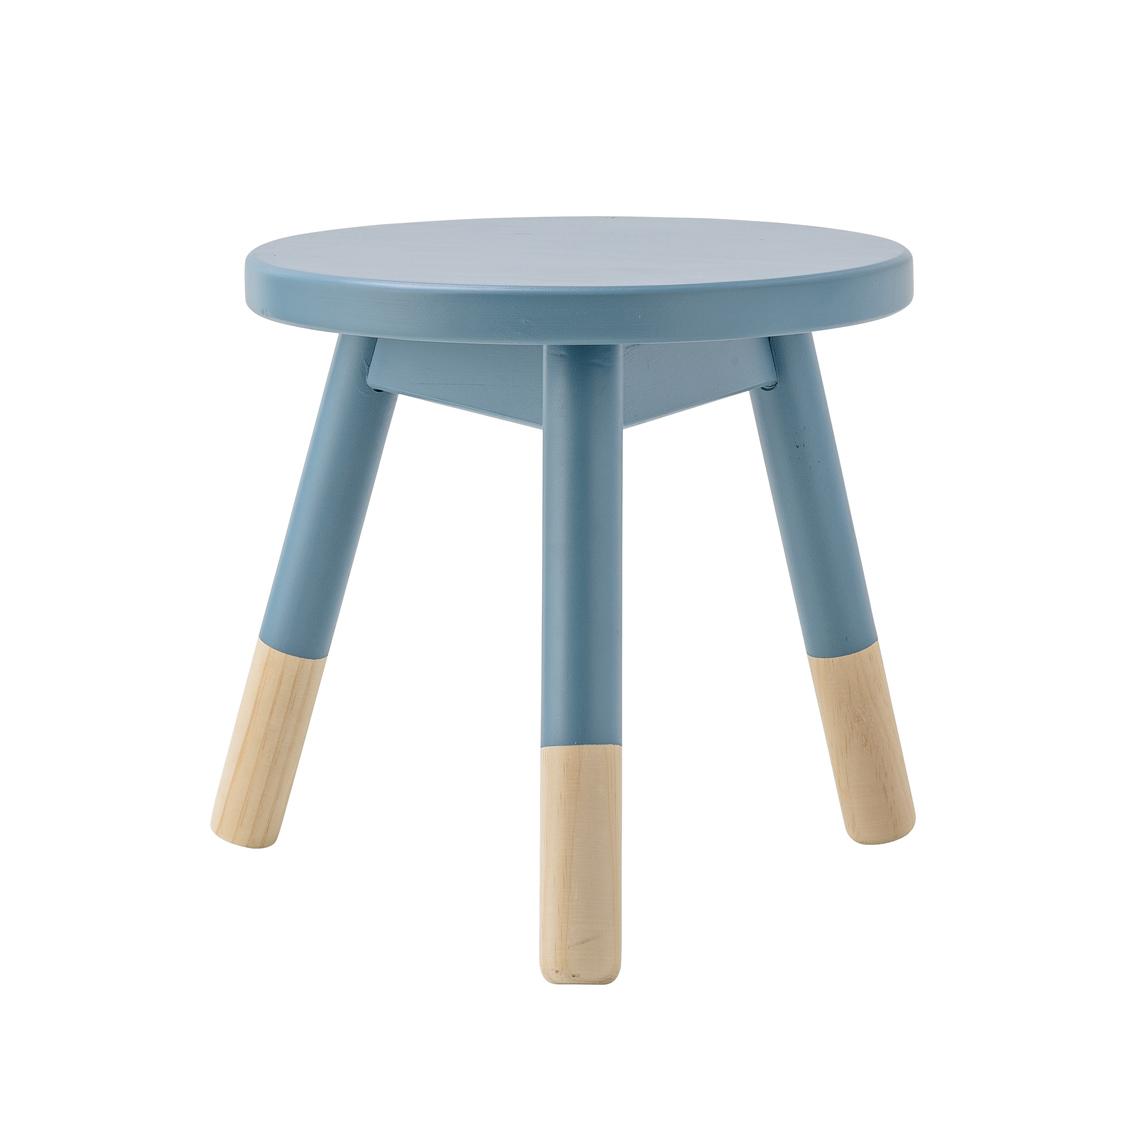 tabouret enfant bleu bloomingville pour chambre enfant les enfants du design. Black Bedroom Furniture Sets. Home Design Ideas